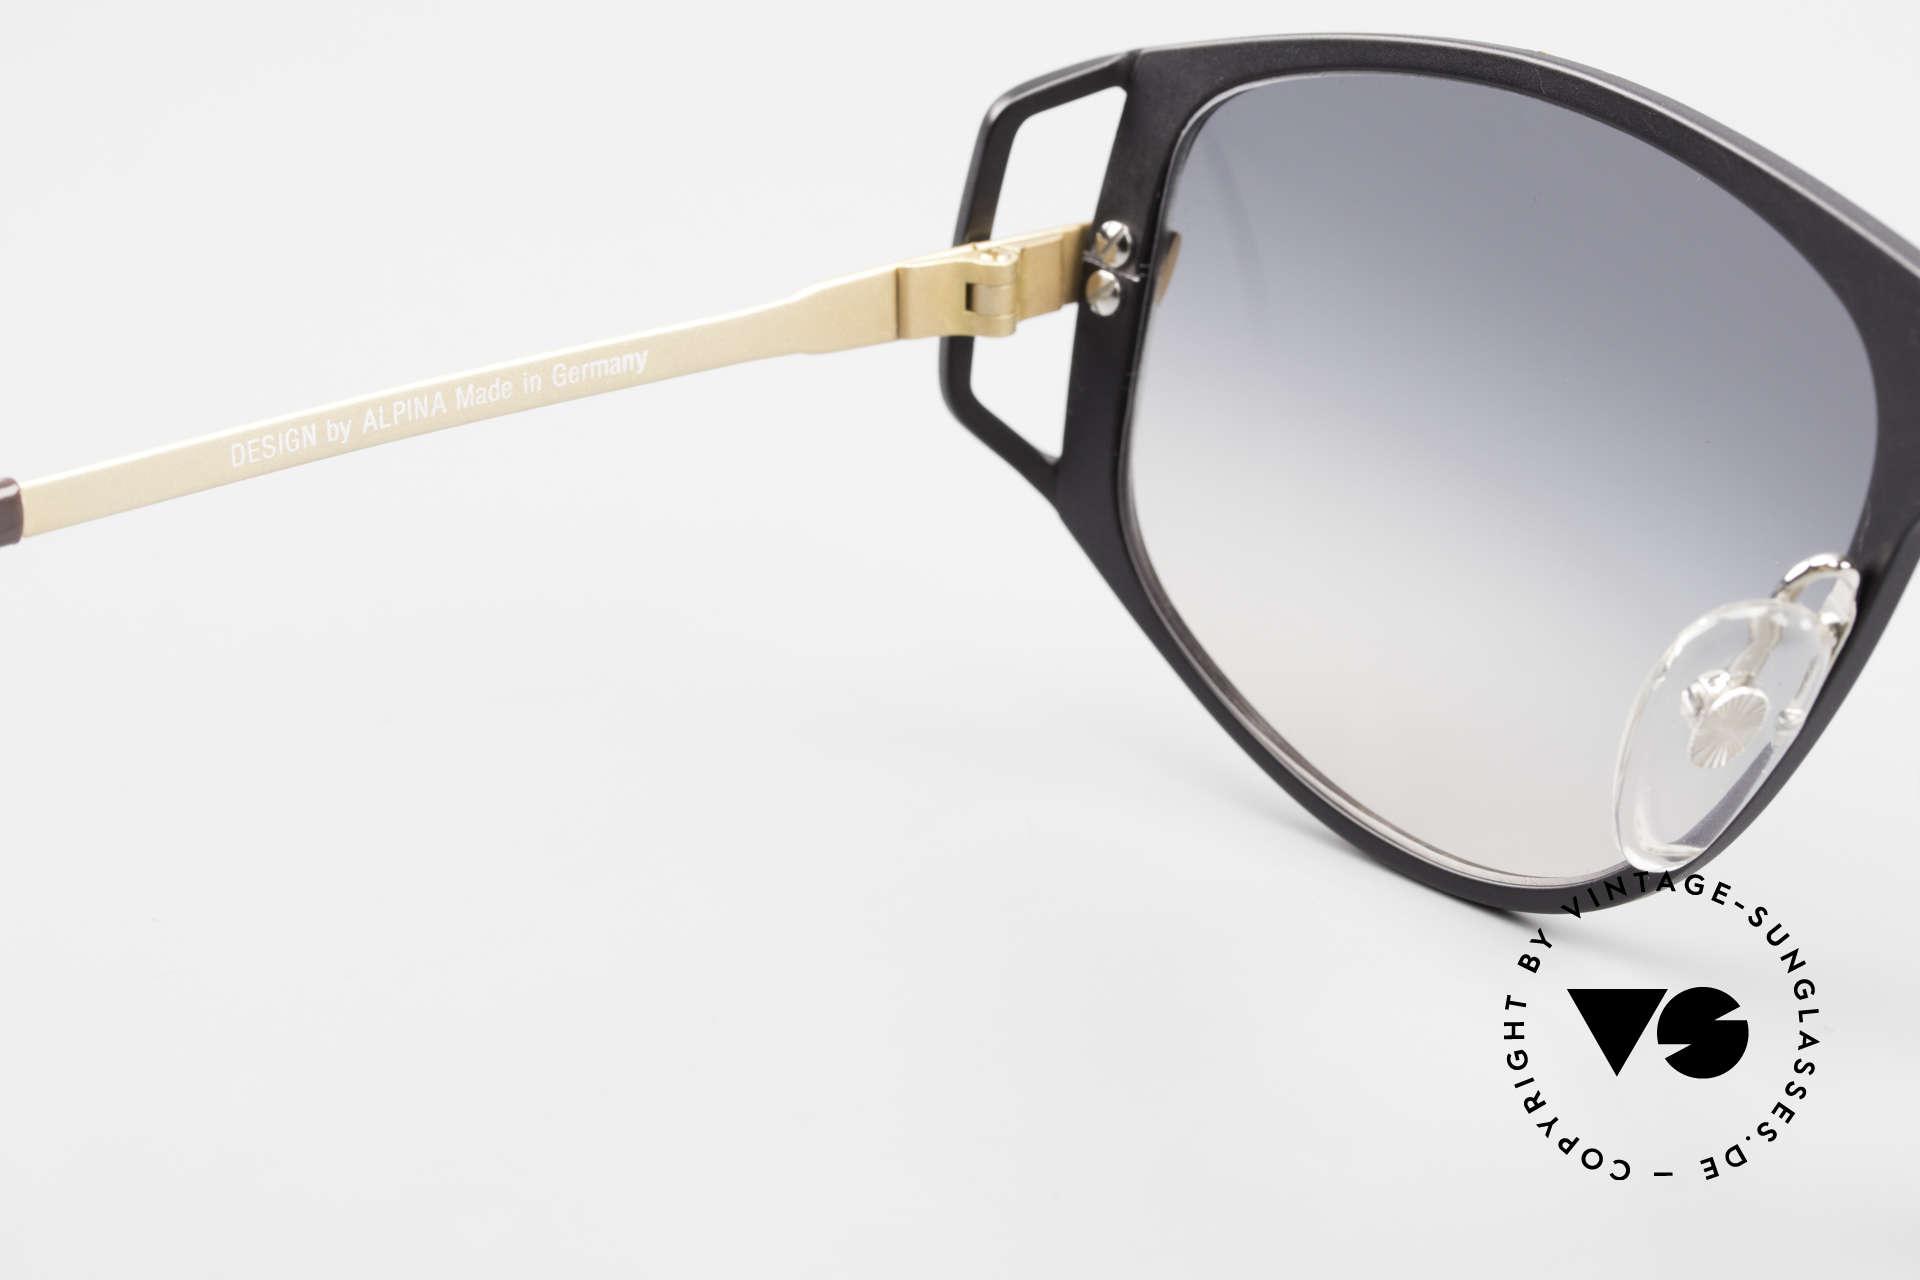 Alpina A51 Ultra Rare 90's XL Sunglasses, NO RETRO fashion; but a rare old original from '91, Made for Men and Women